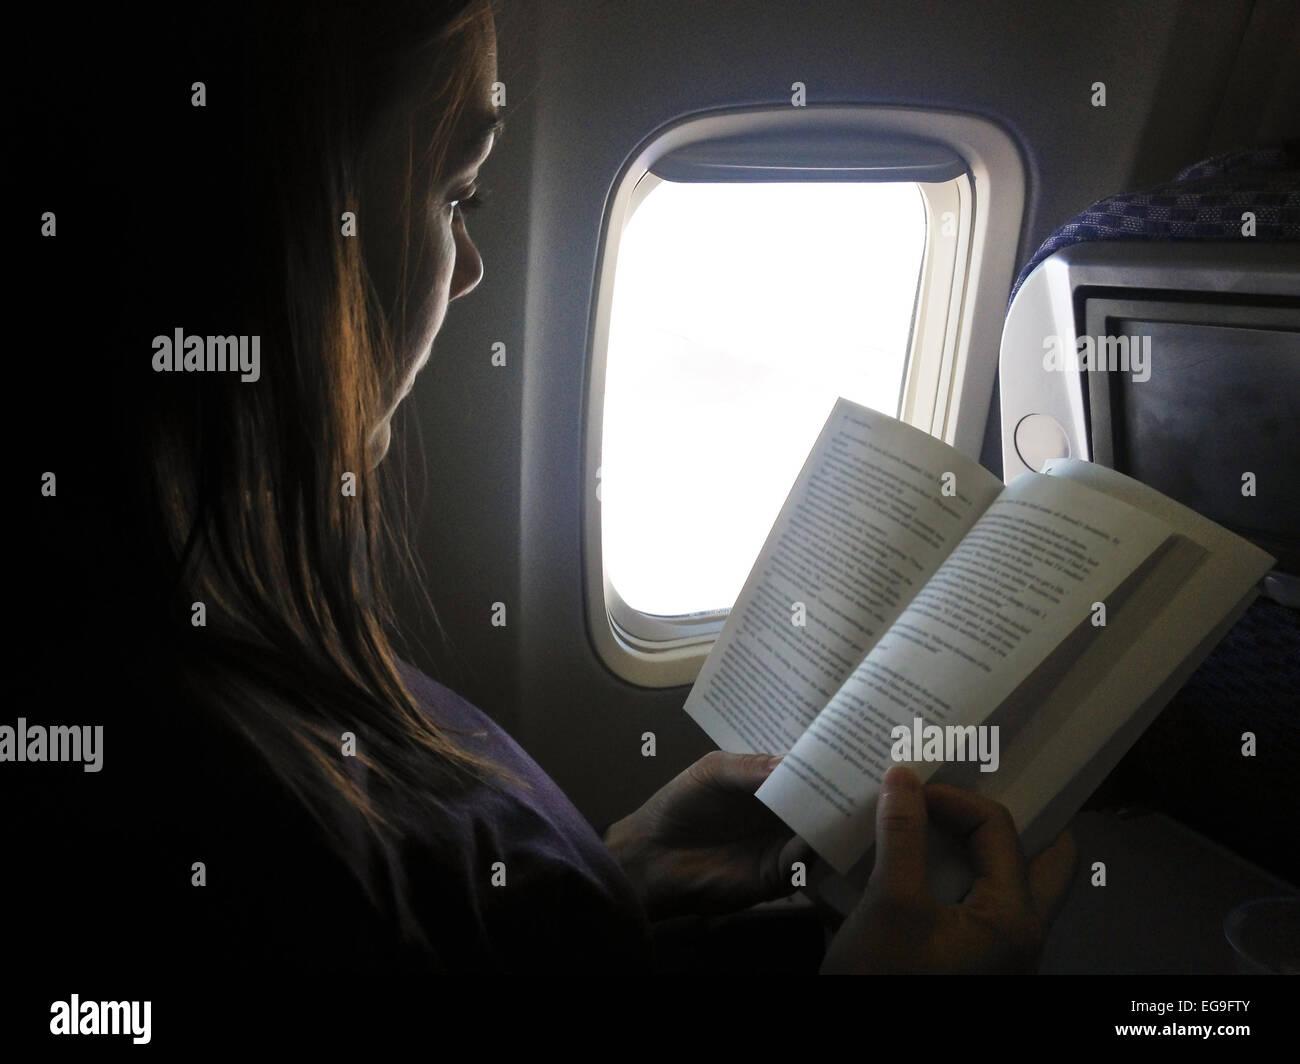 Woman reading on flight - Stock Image